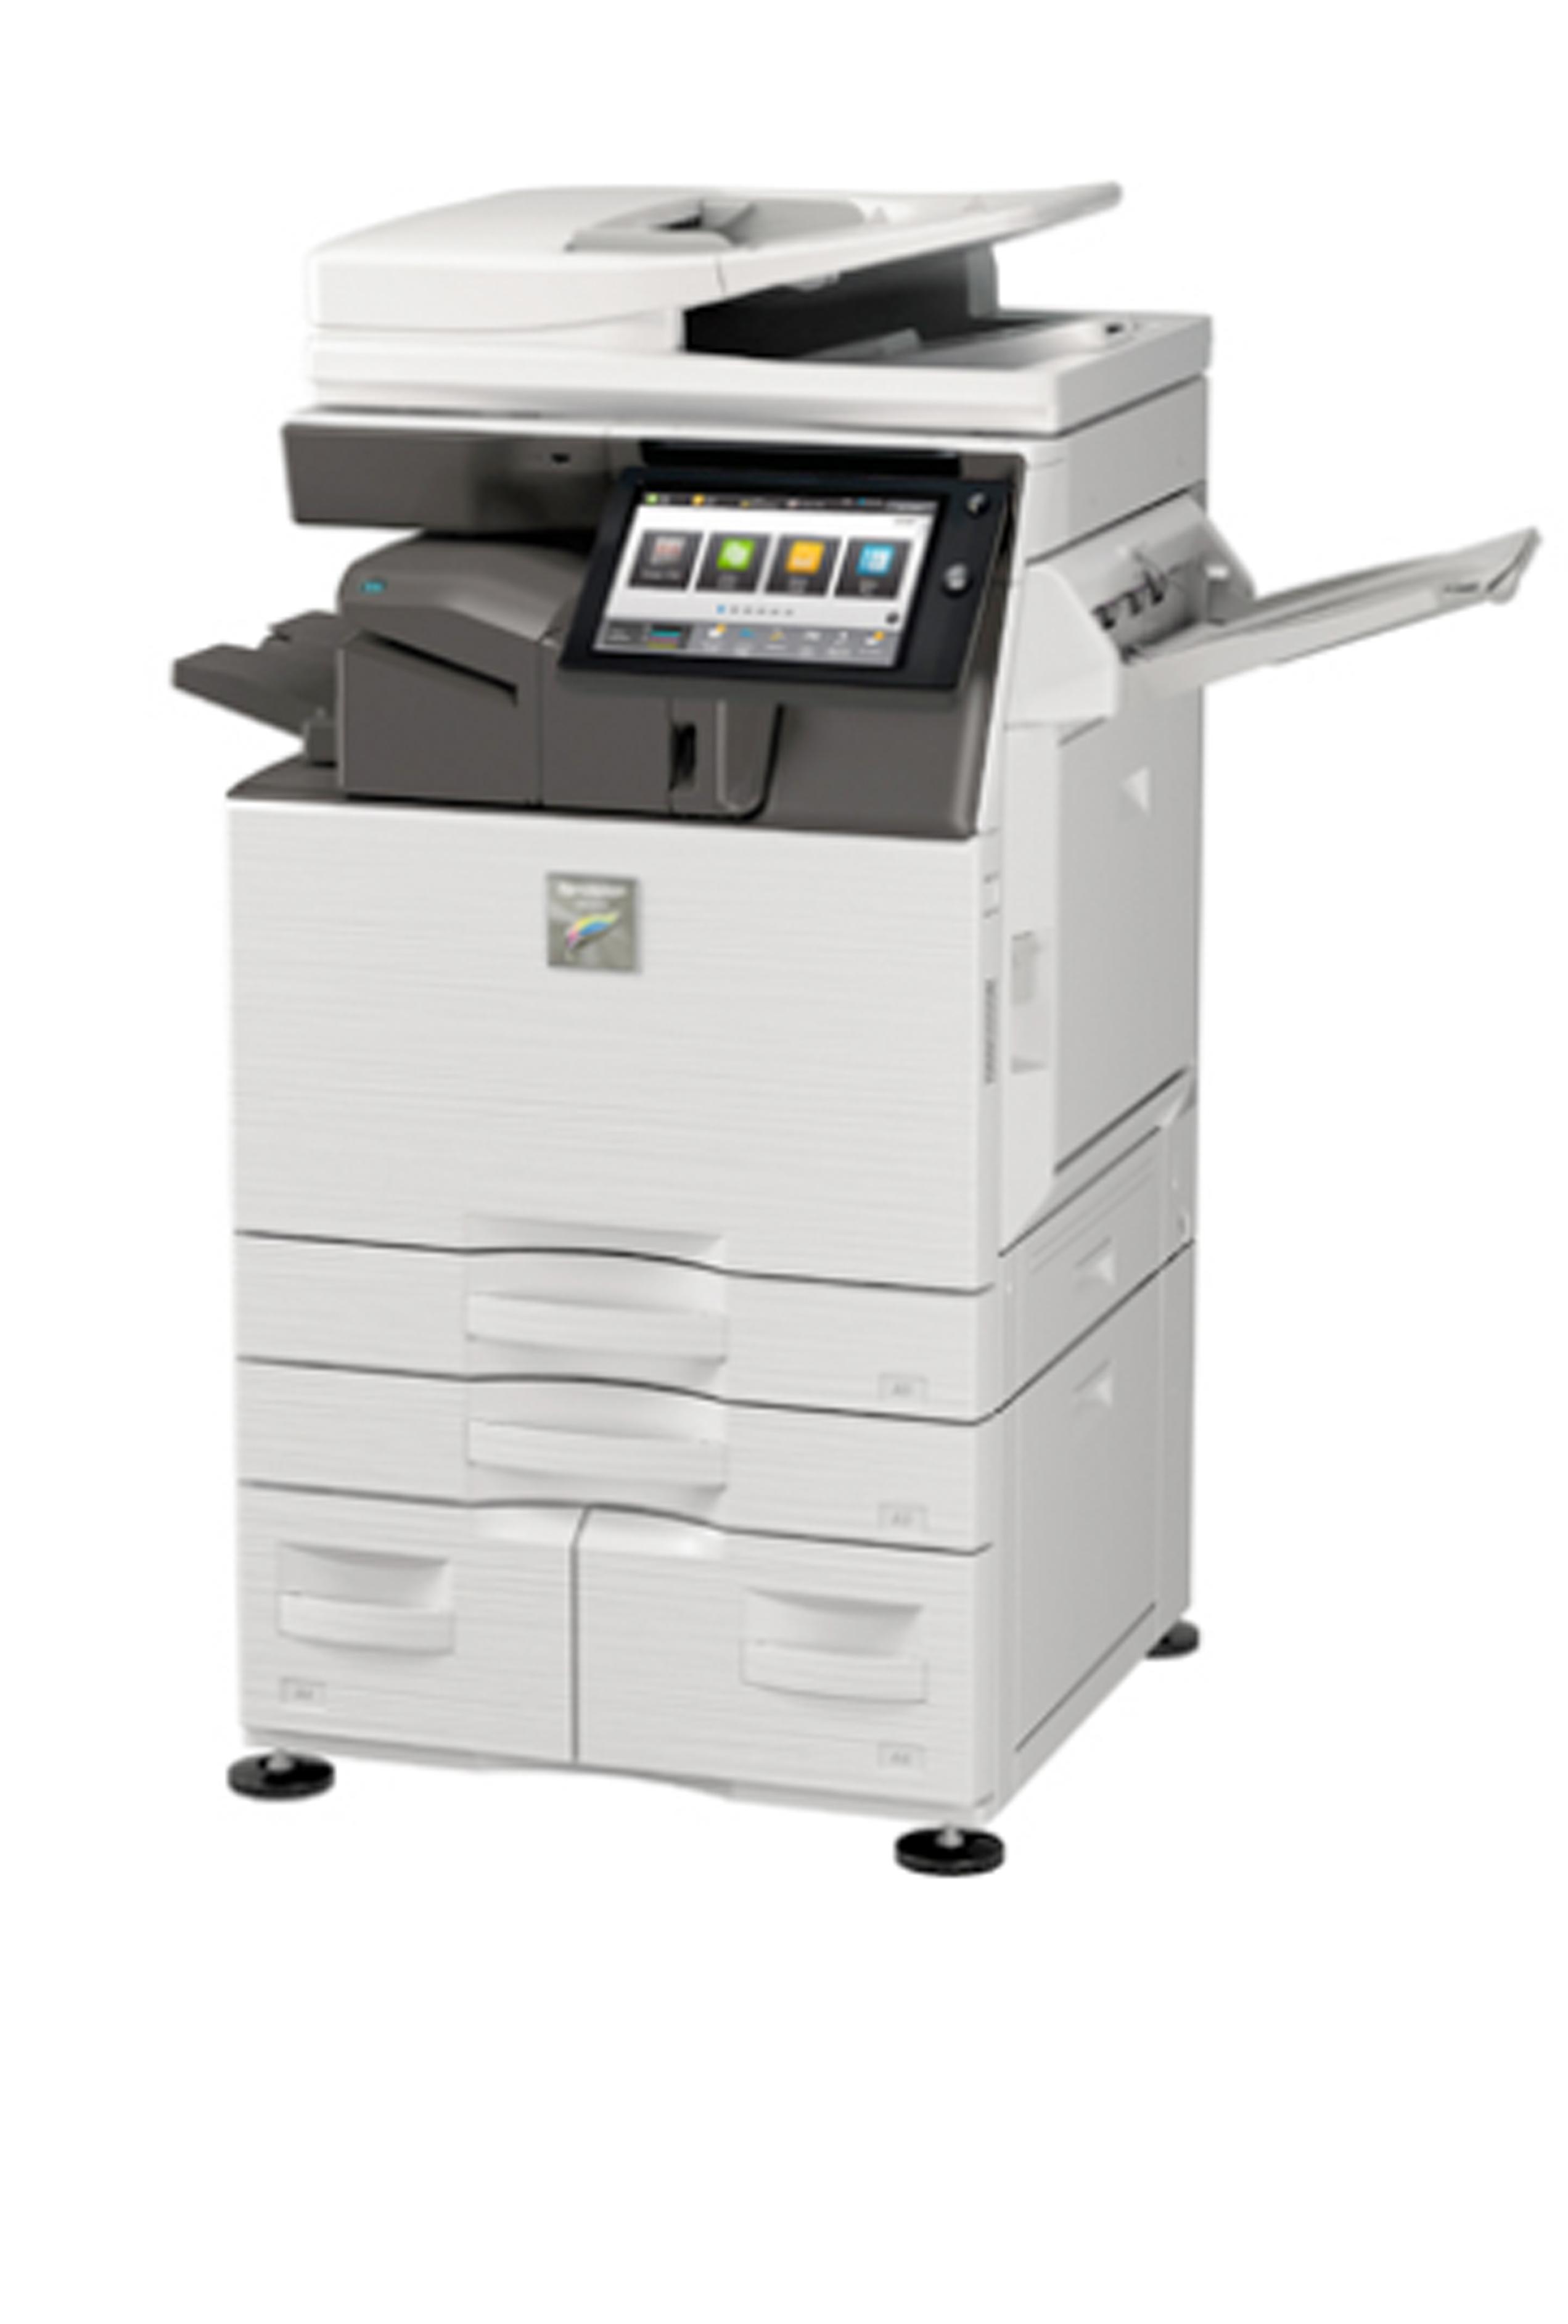 Sharp copier printer